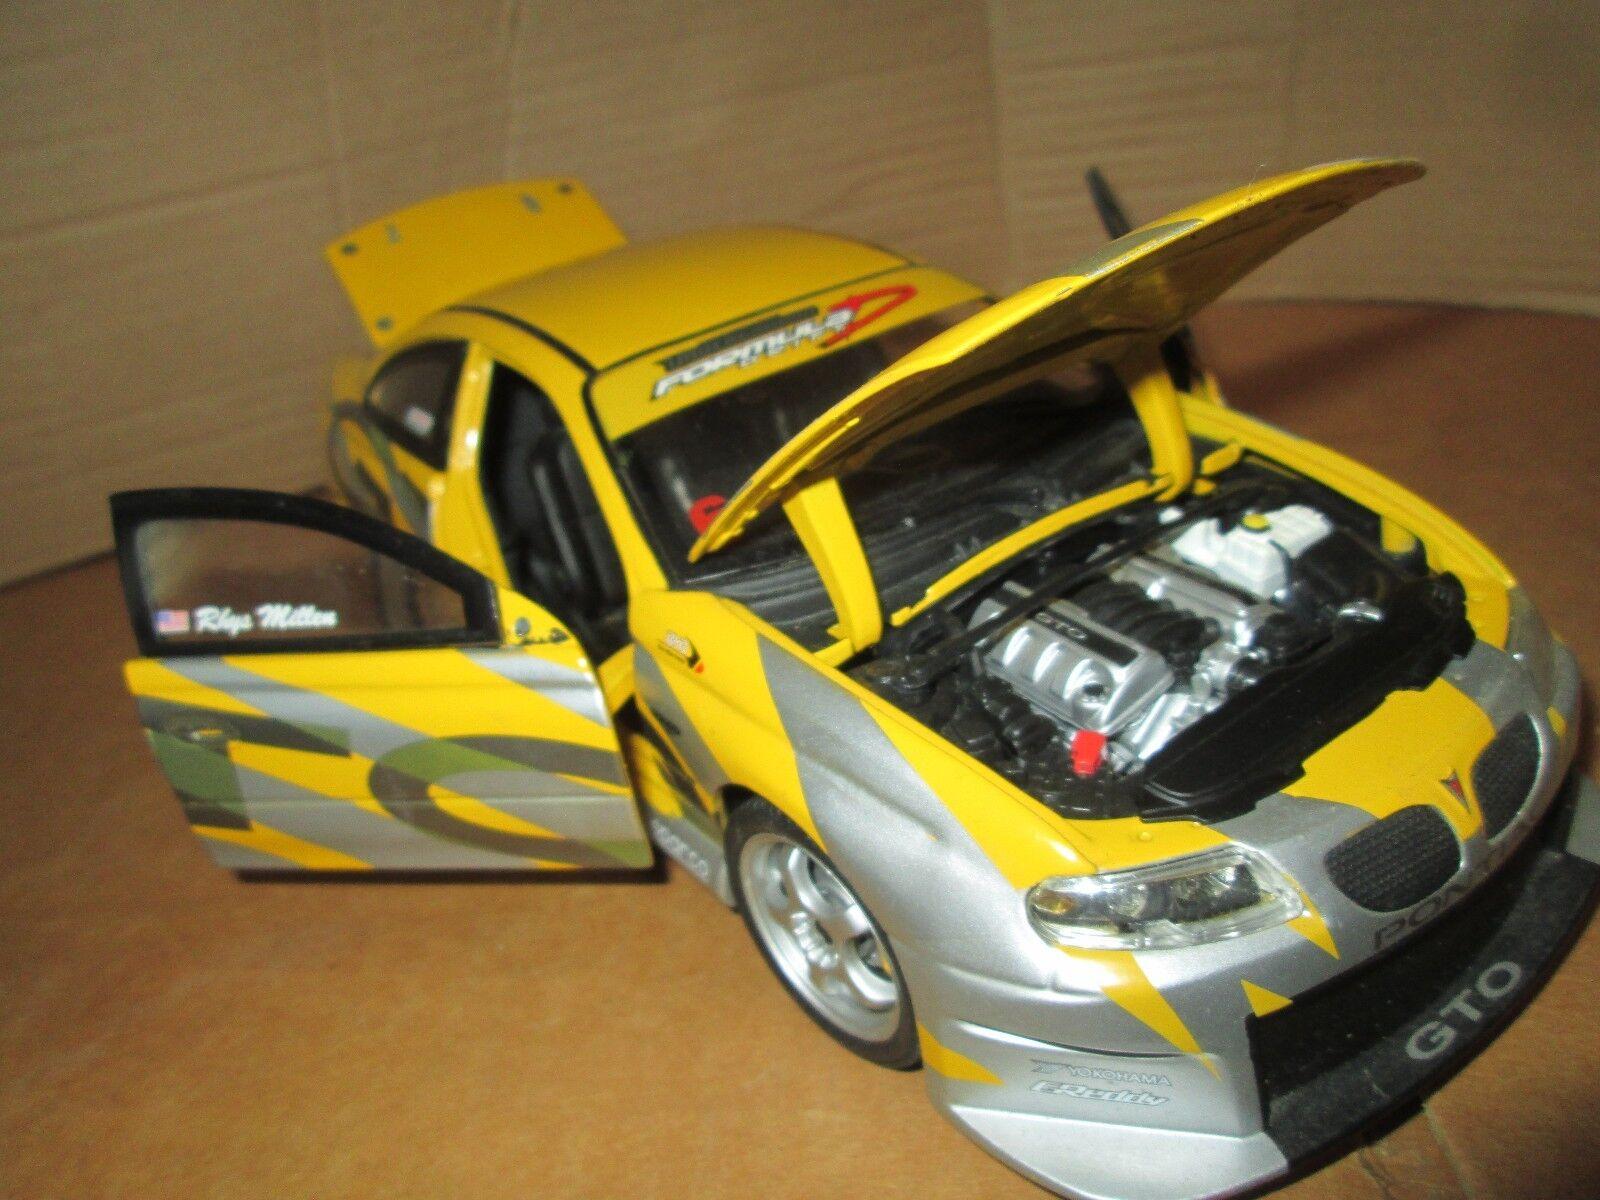 2004 PONTIAC GTO 1 18 JOY RIDE LIMITED Rally Racing version loose Affichage Pièce